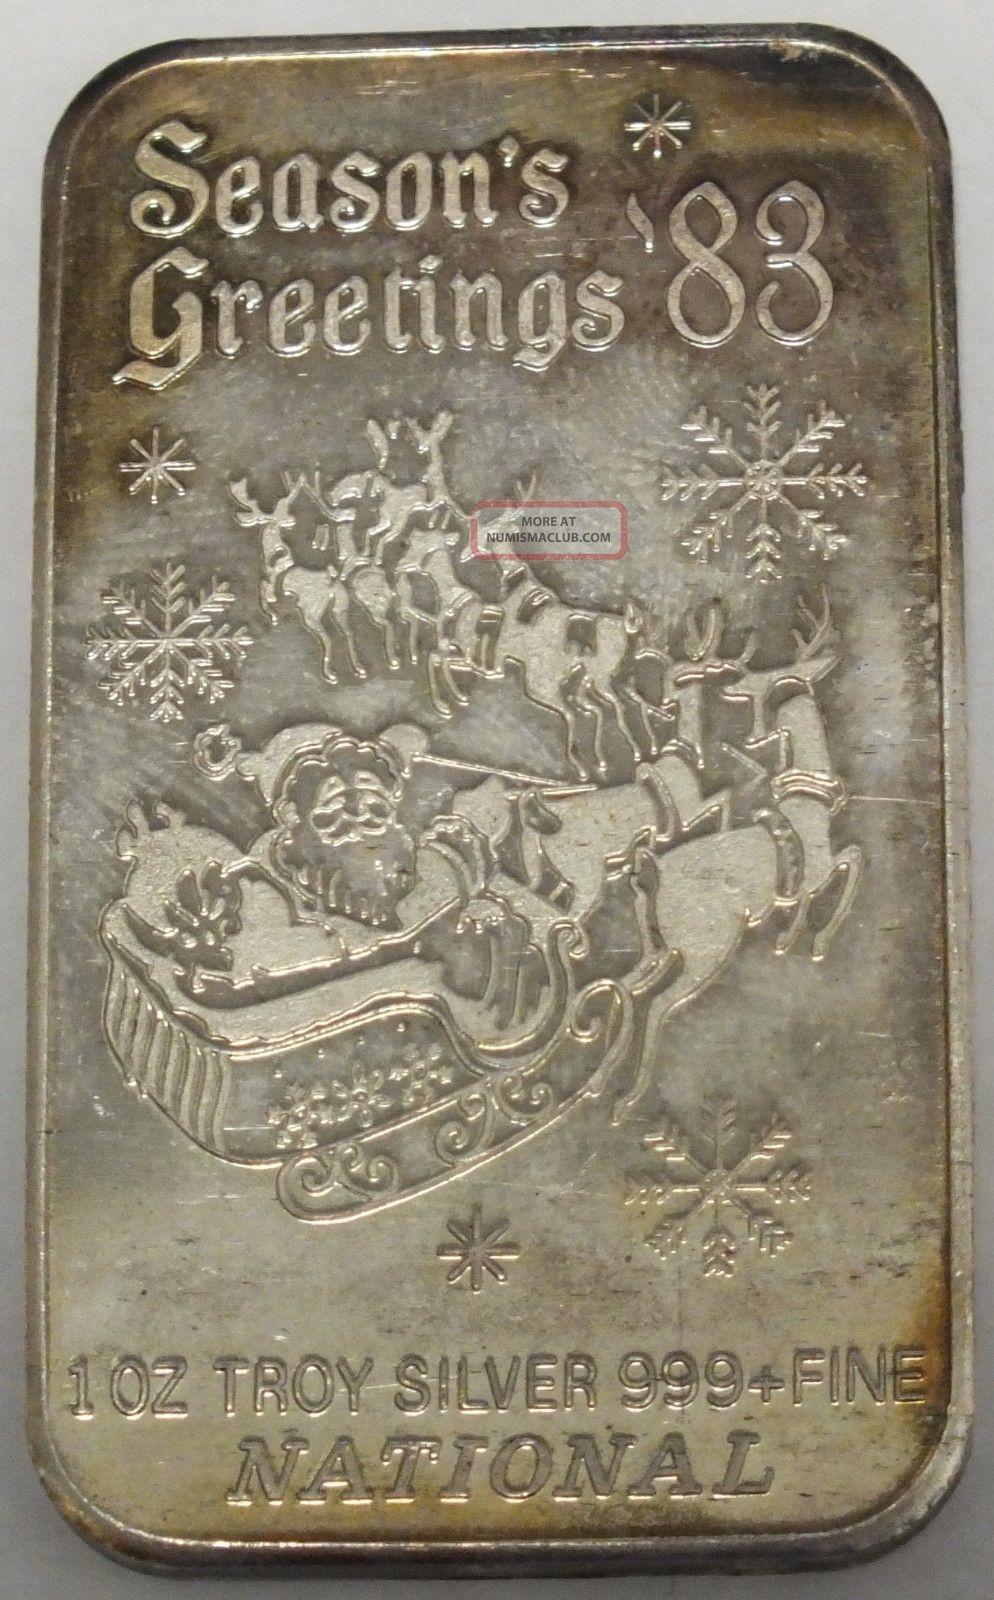 National Season S Greetings 1983 999 Fine Silver Art